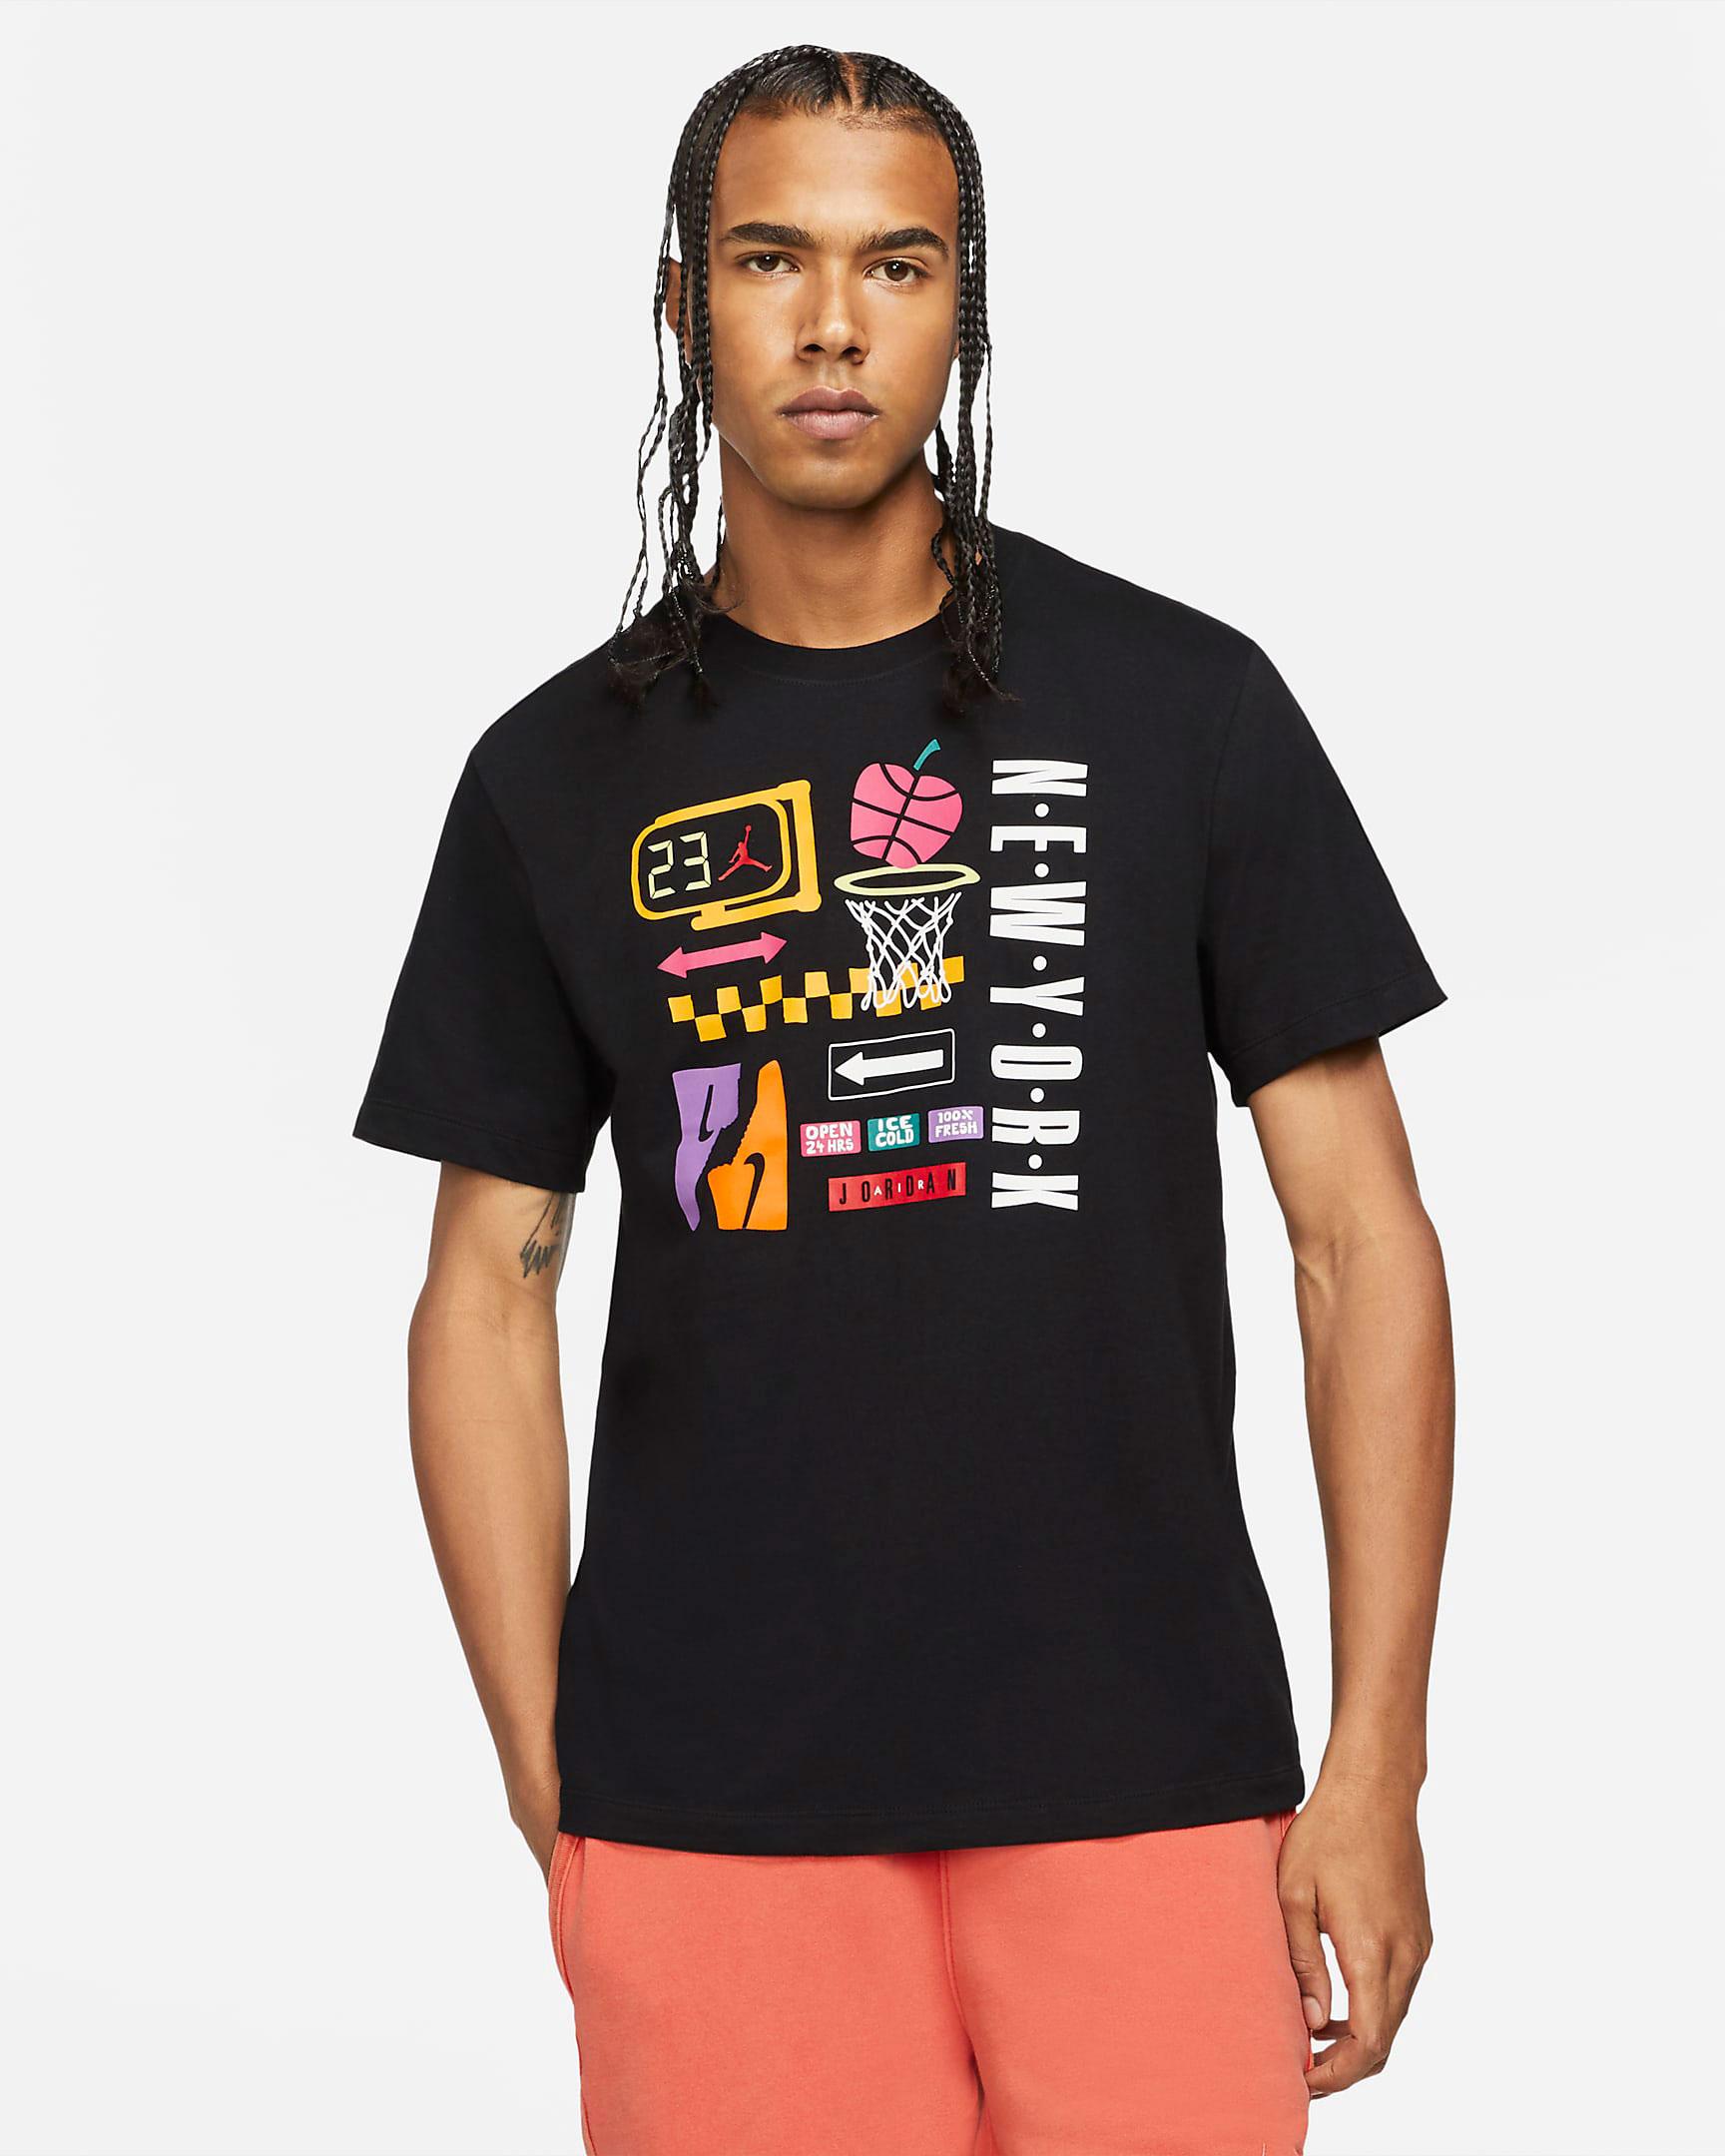 air-jordan-5-what-the-new-york-nyc-tee-shirt-black